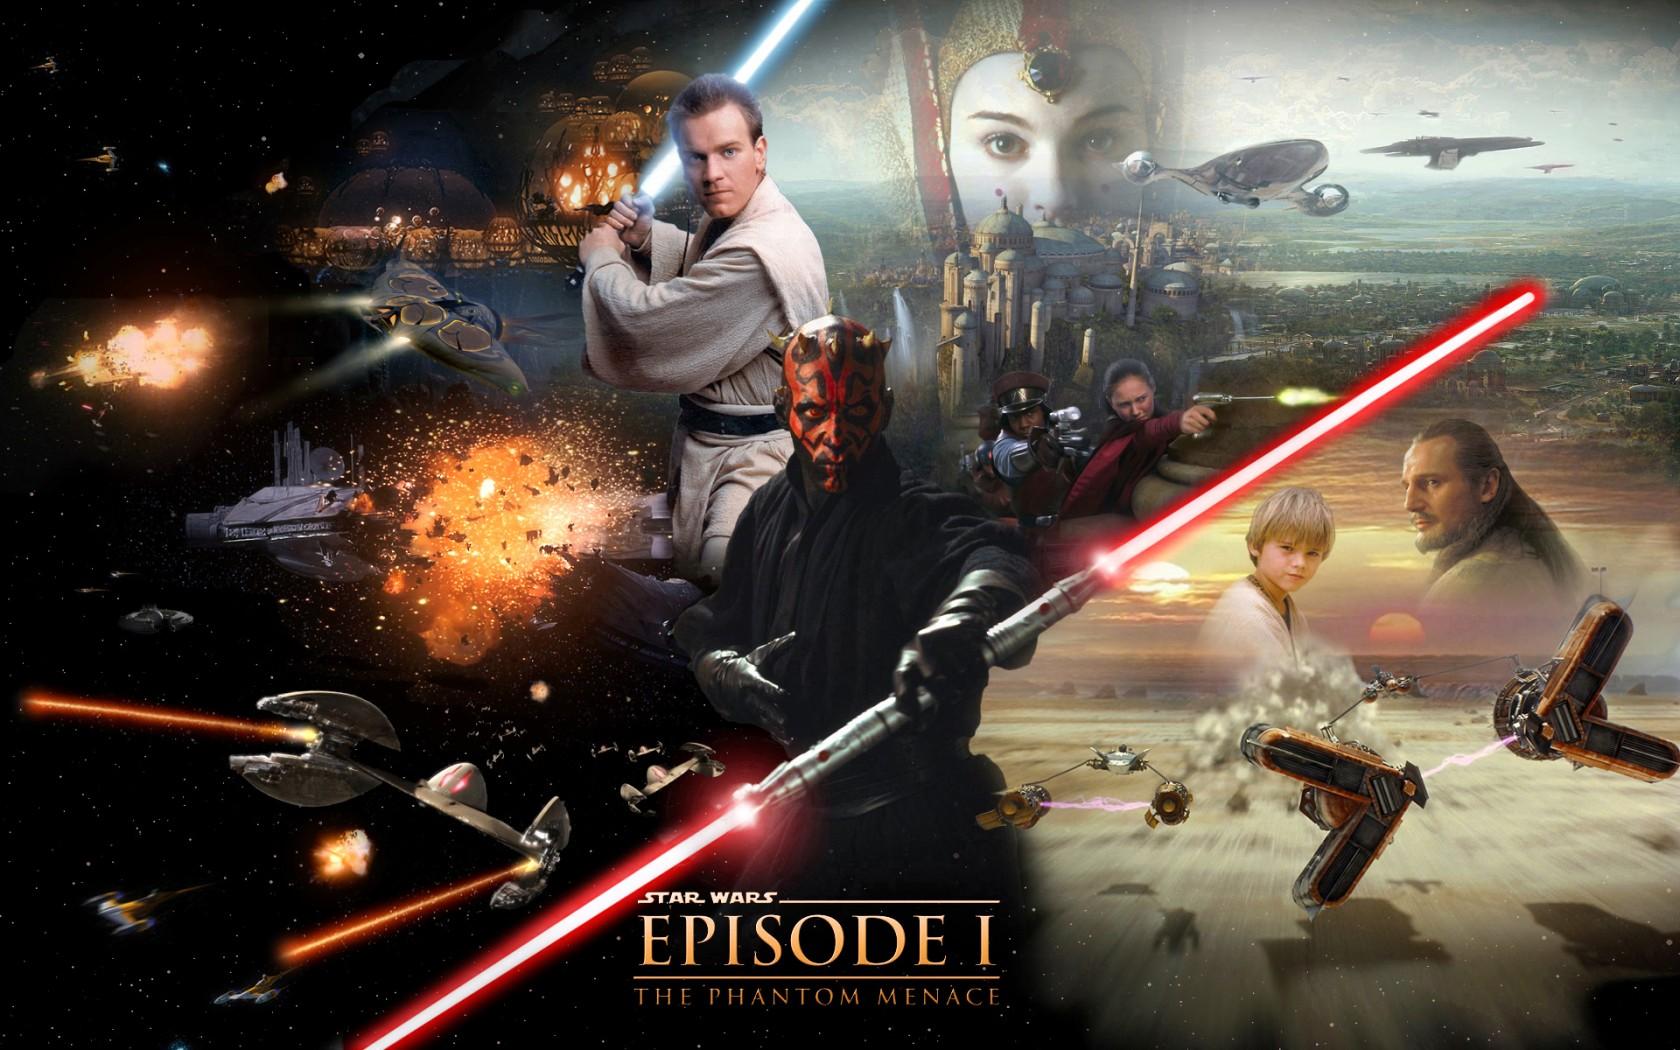 Star Wars Windows 10 Wallpaper